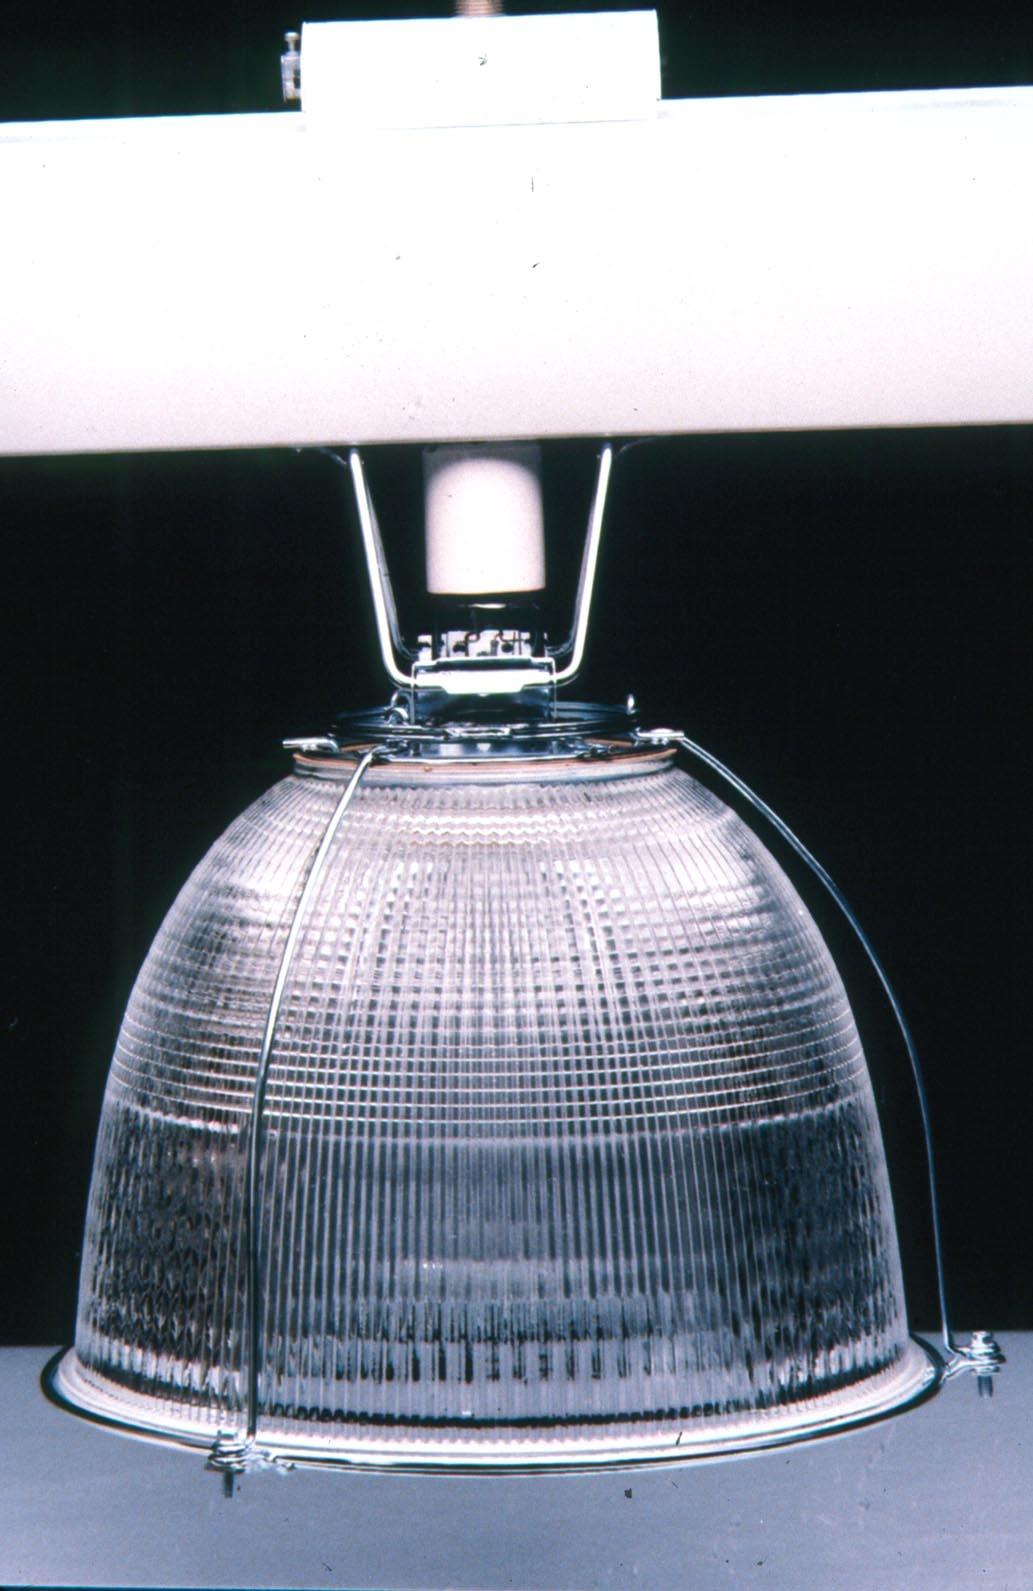 new holophane prisma prismatron r electronic ballasts. Black Bedroom Furniture Sets. Home Design Ideas